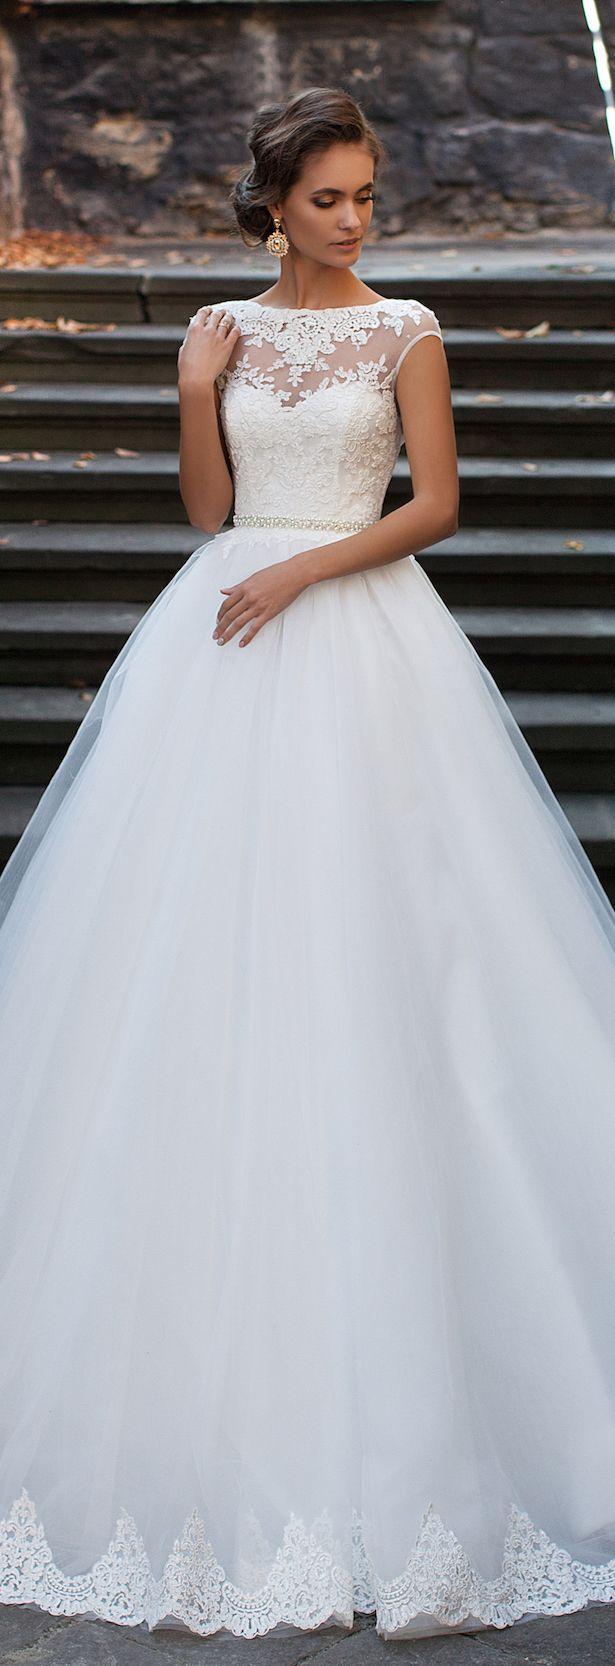 Wedding-Dresses-1079